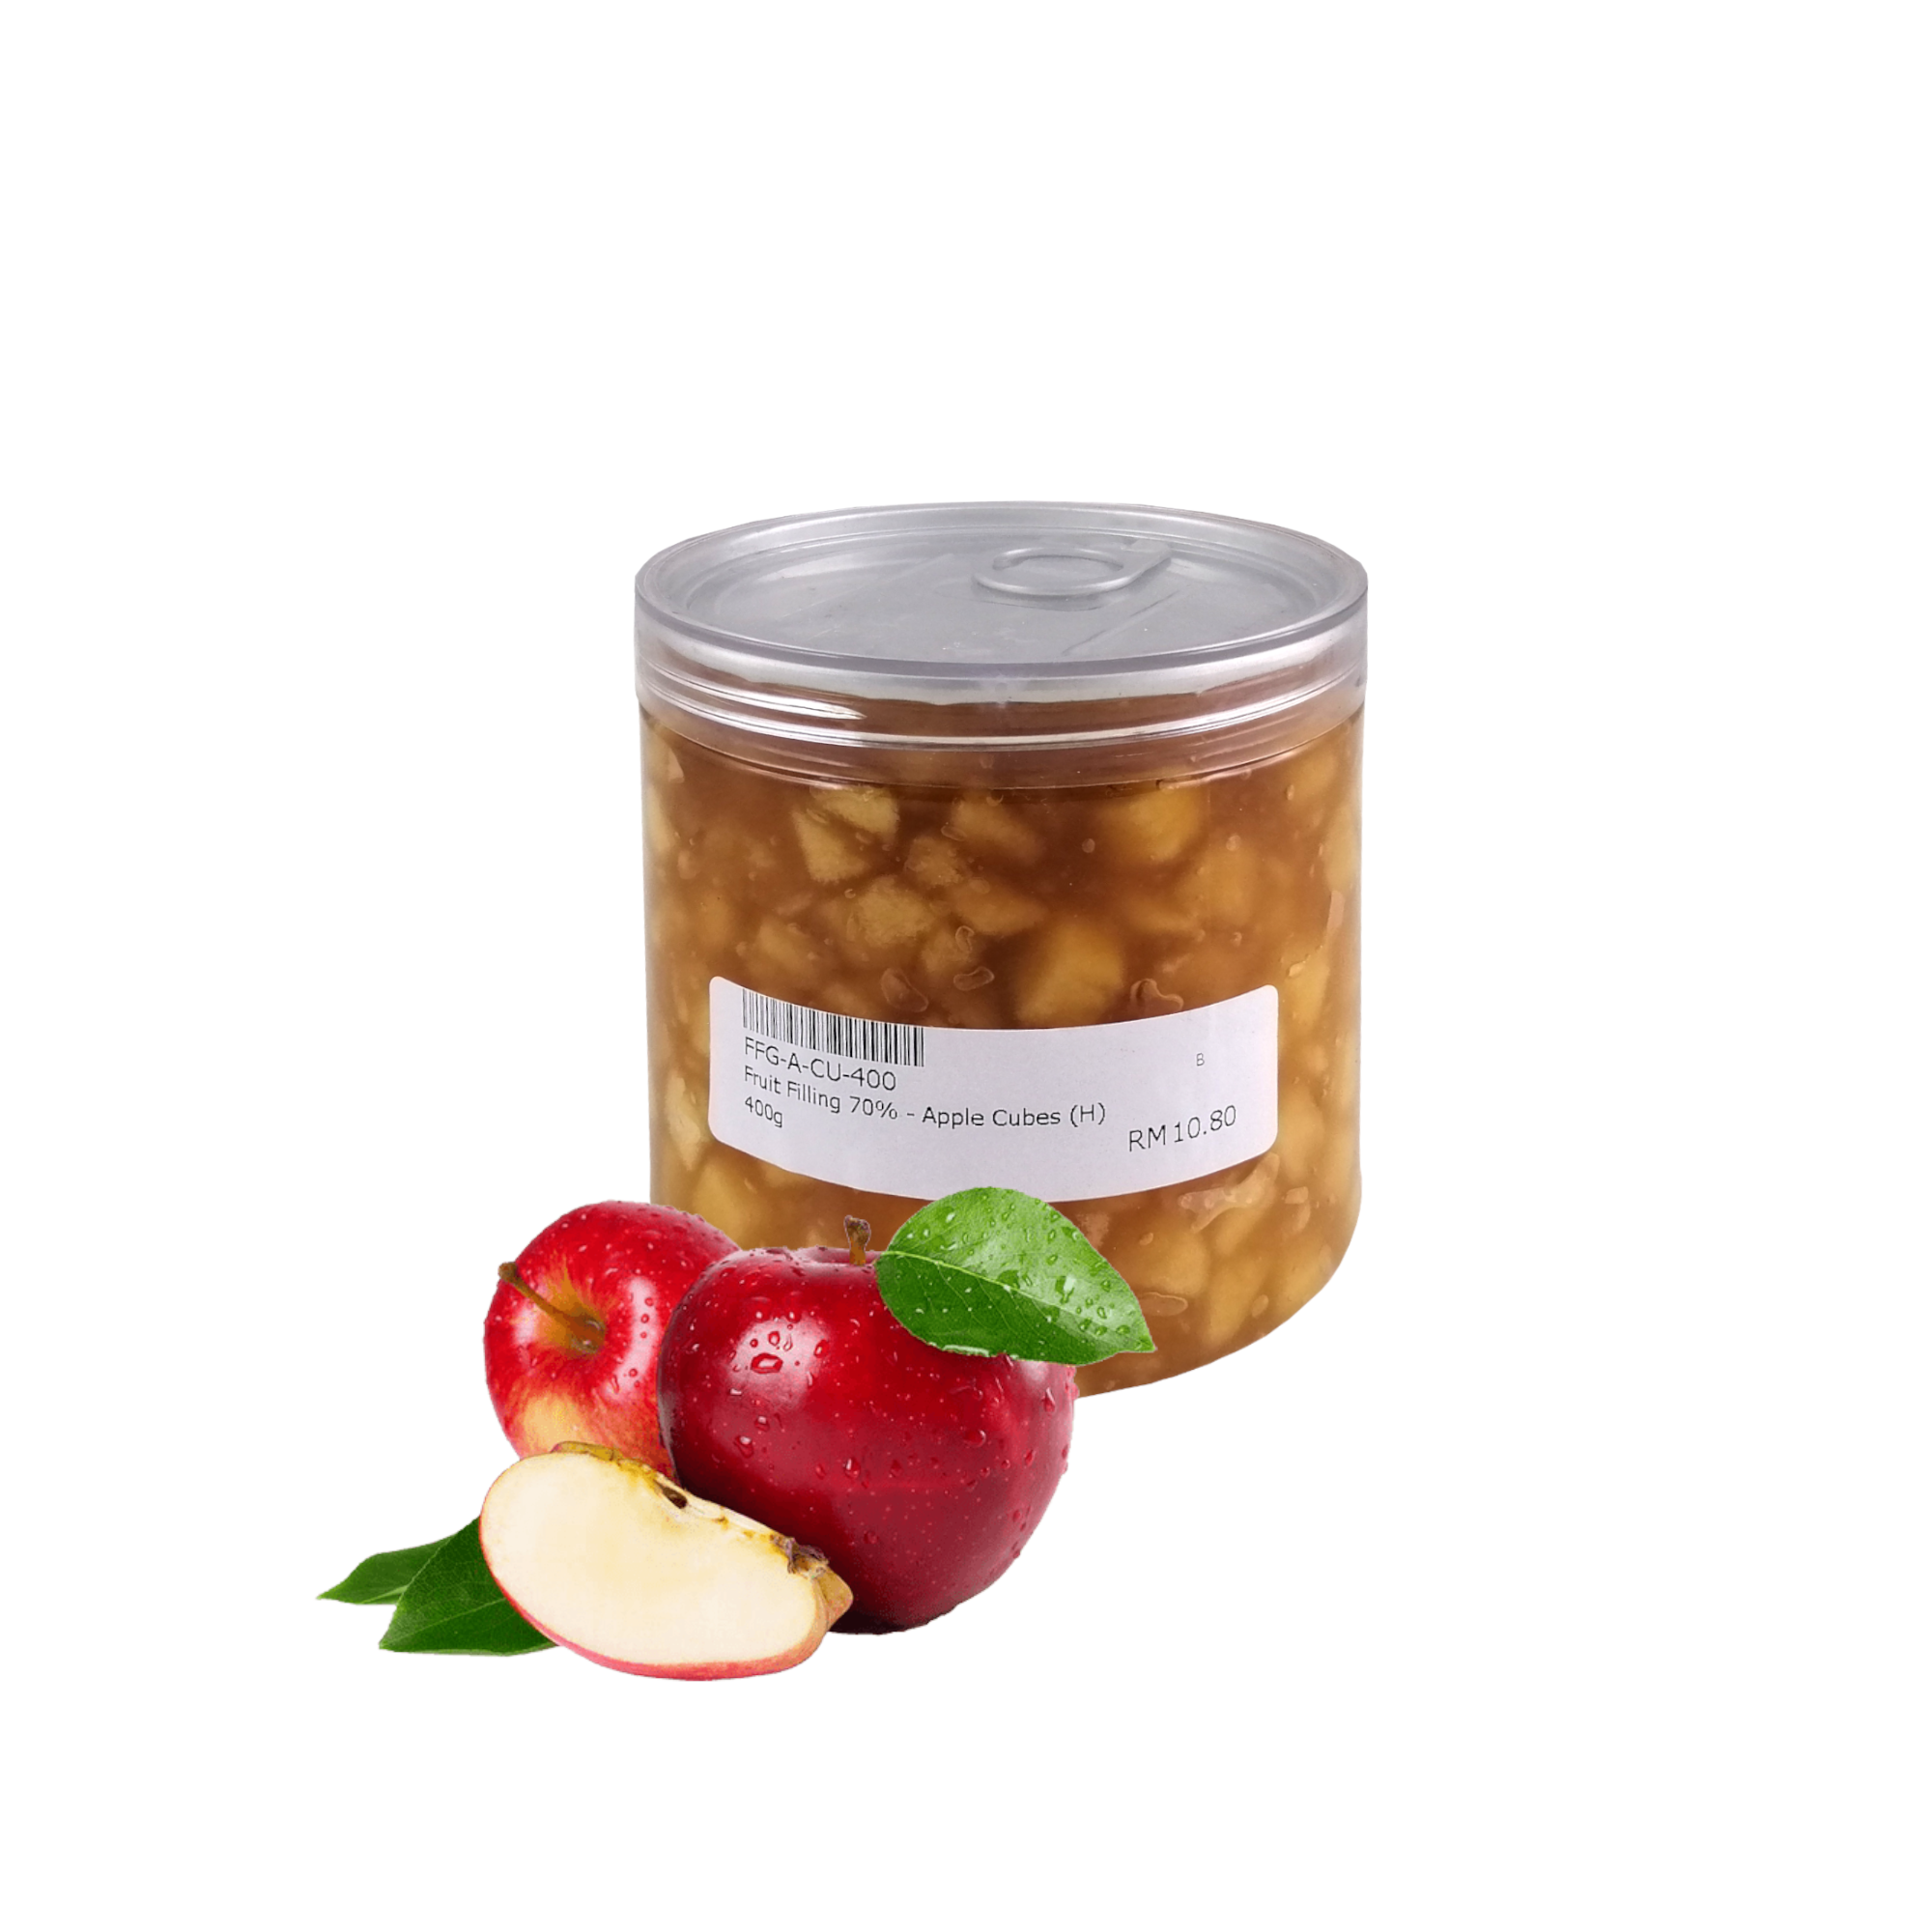 Fruit Filling, Apple Cubes, 70%, Belgium, 400 g